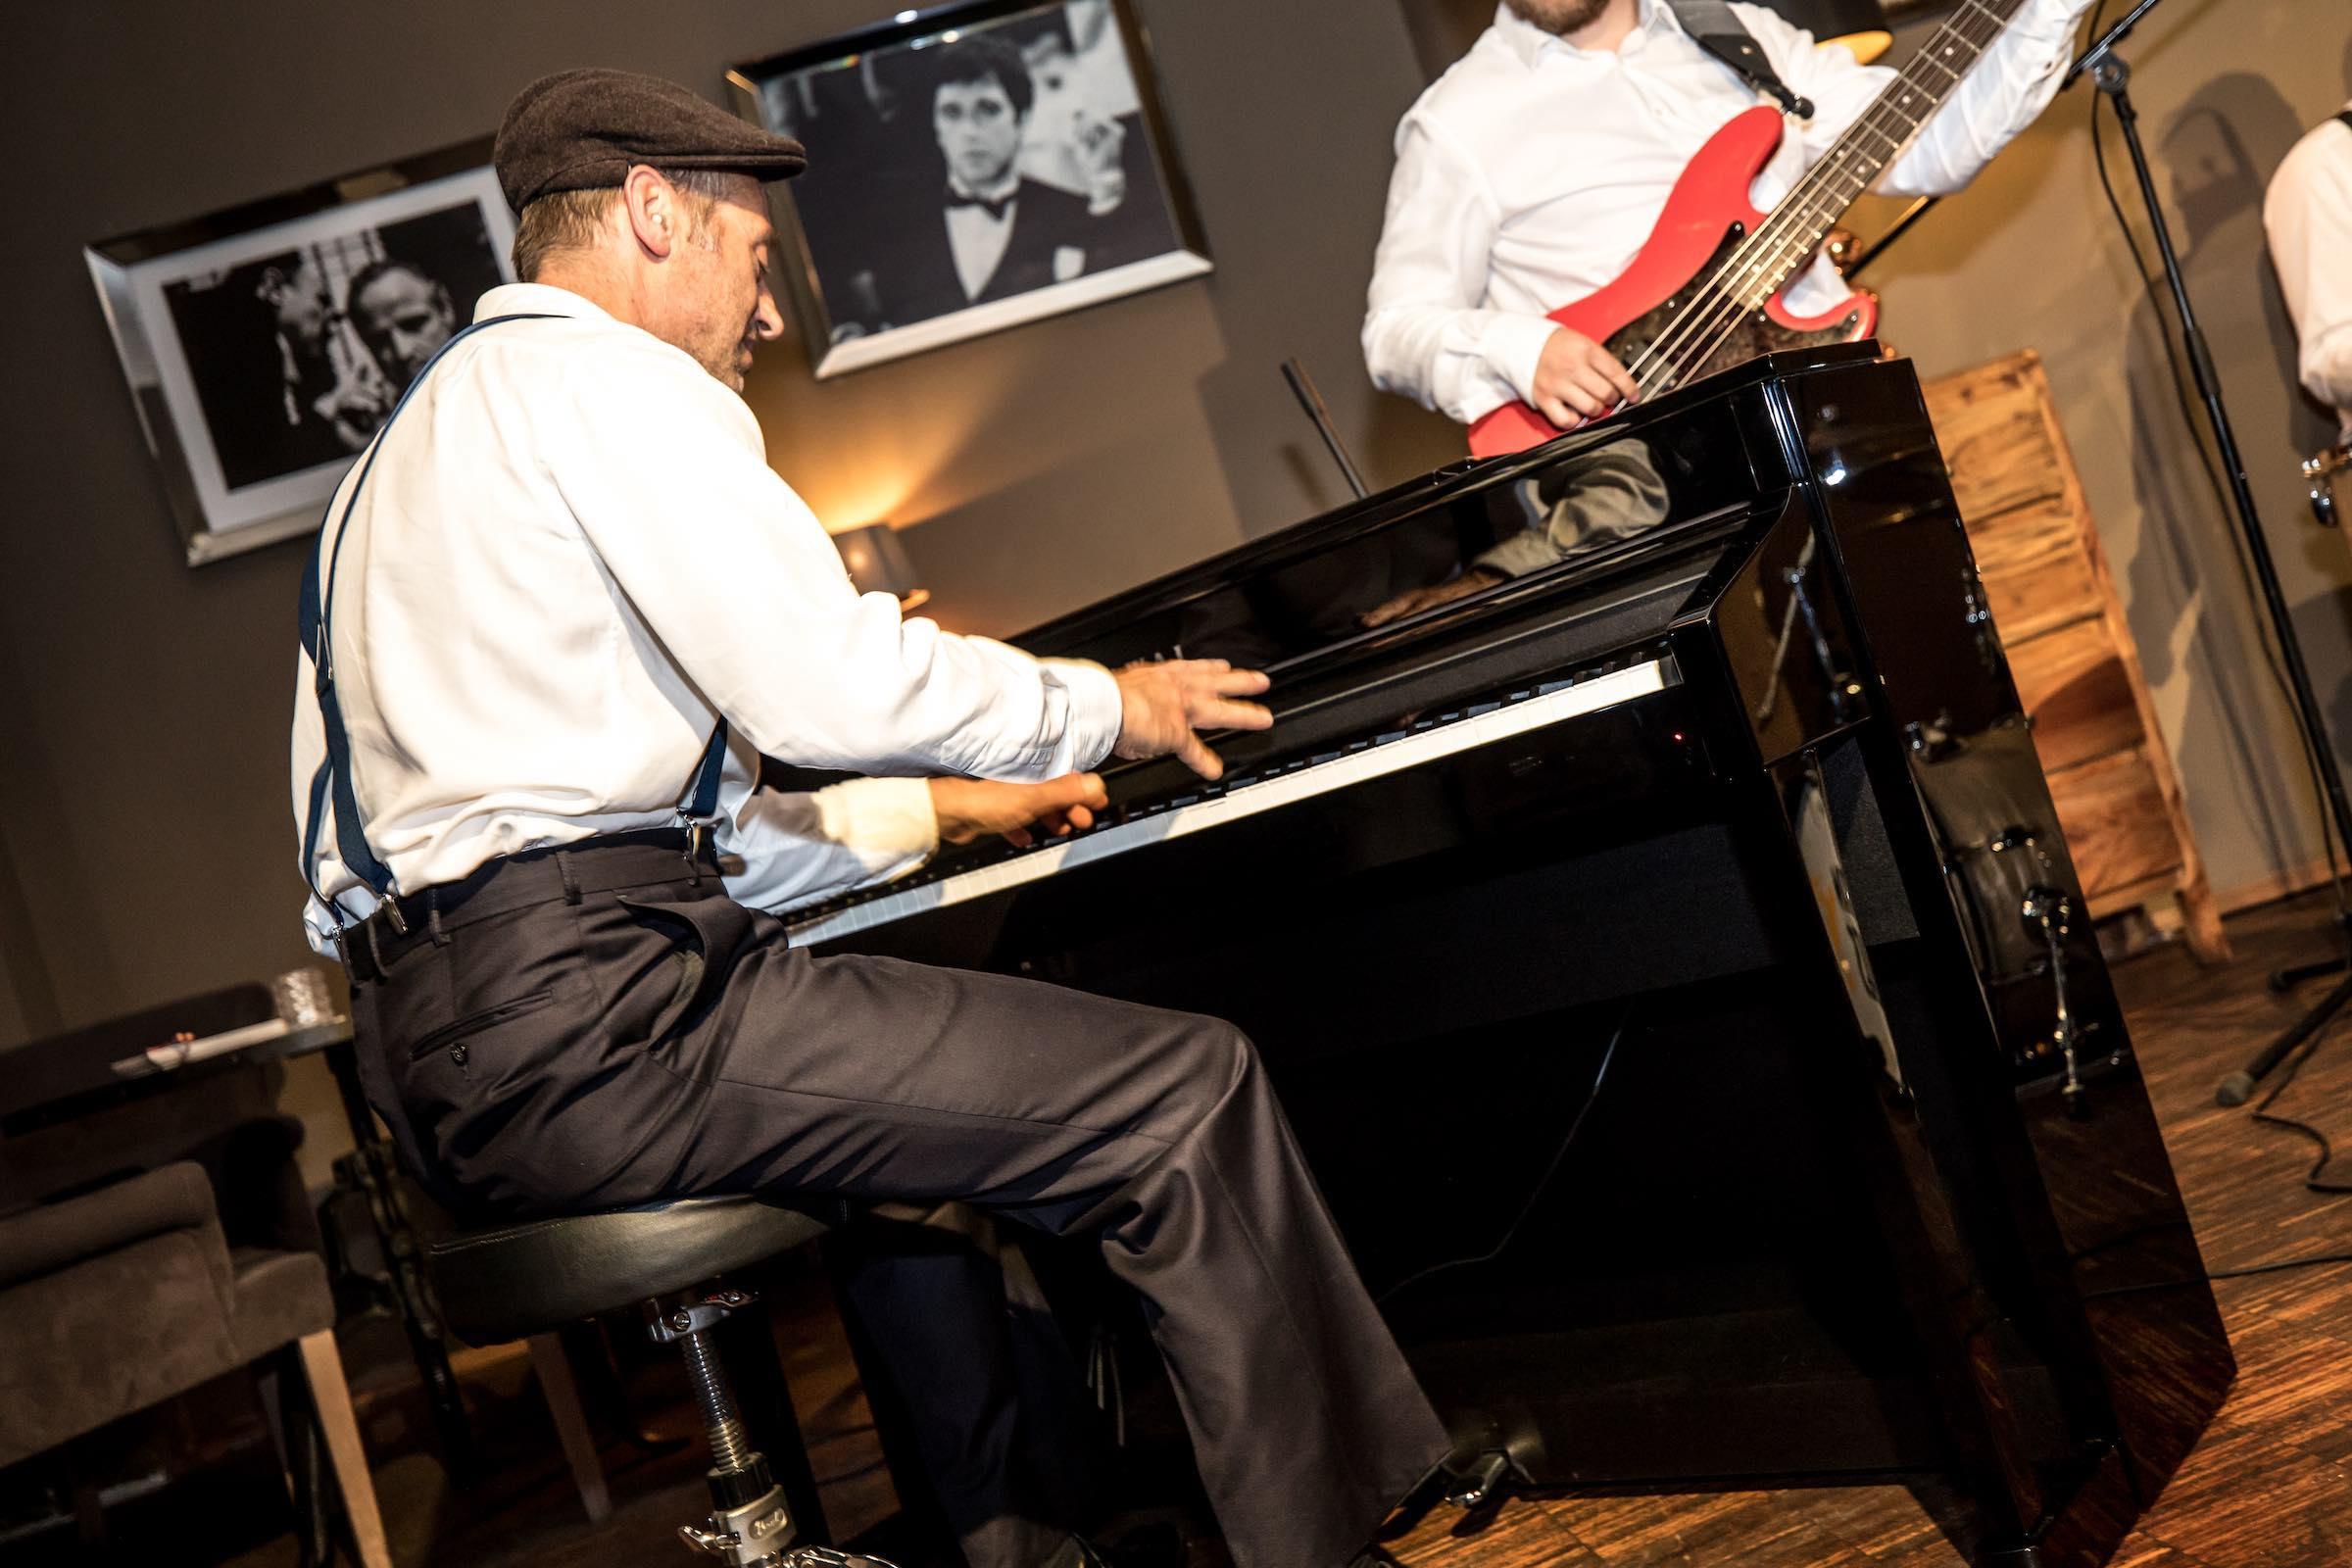 Klavierspieler   Pianist   Hannover   Flügel   Piano   Hochzeit   Buchen   Livemusik   Jazz   Swing   Pop   Motown   Soul   Klavier   Messe   Firmenfeier   Empfang   Buchen   Mieten   Anfragen   Lehmann   Eventservice